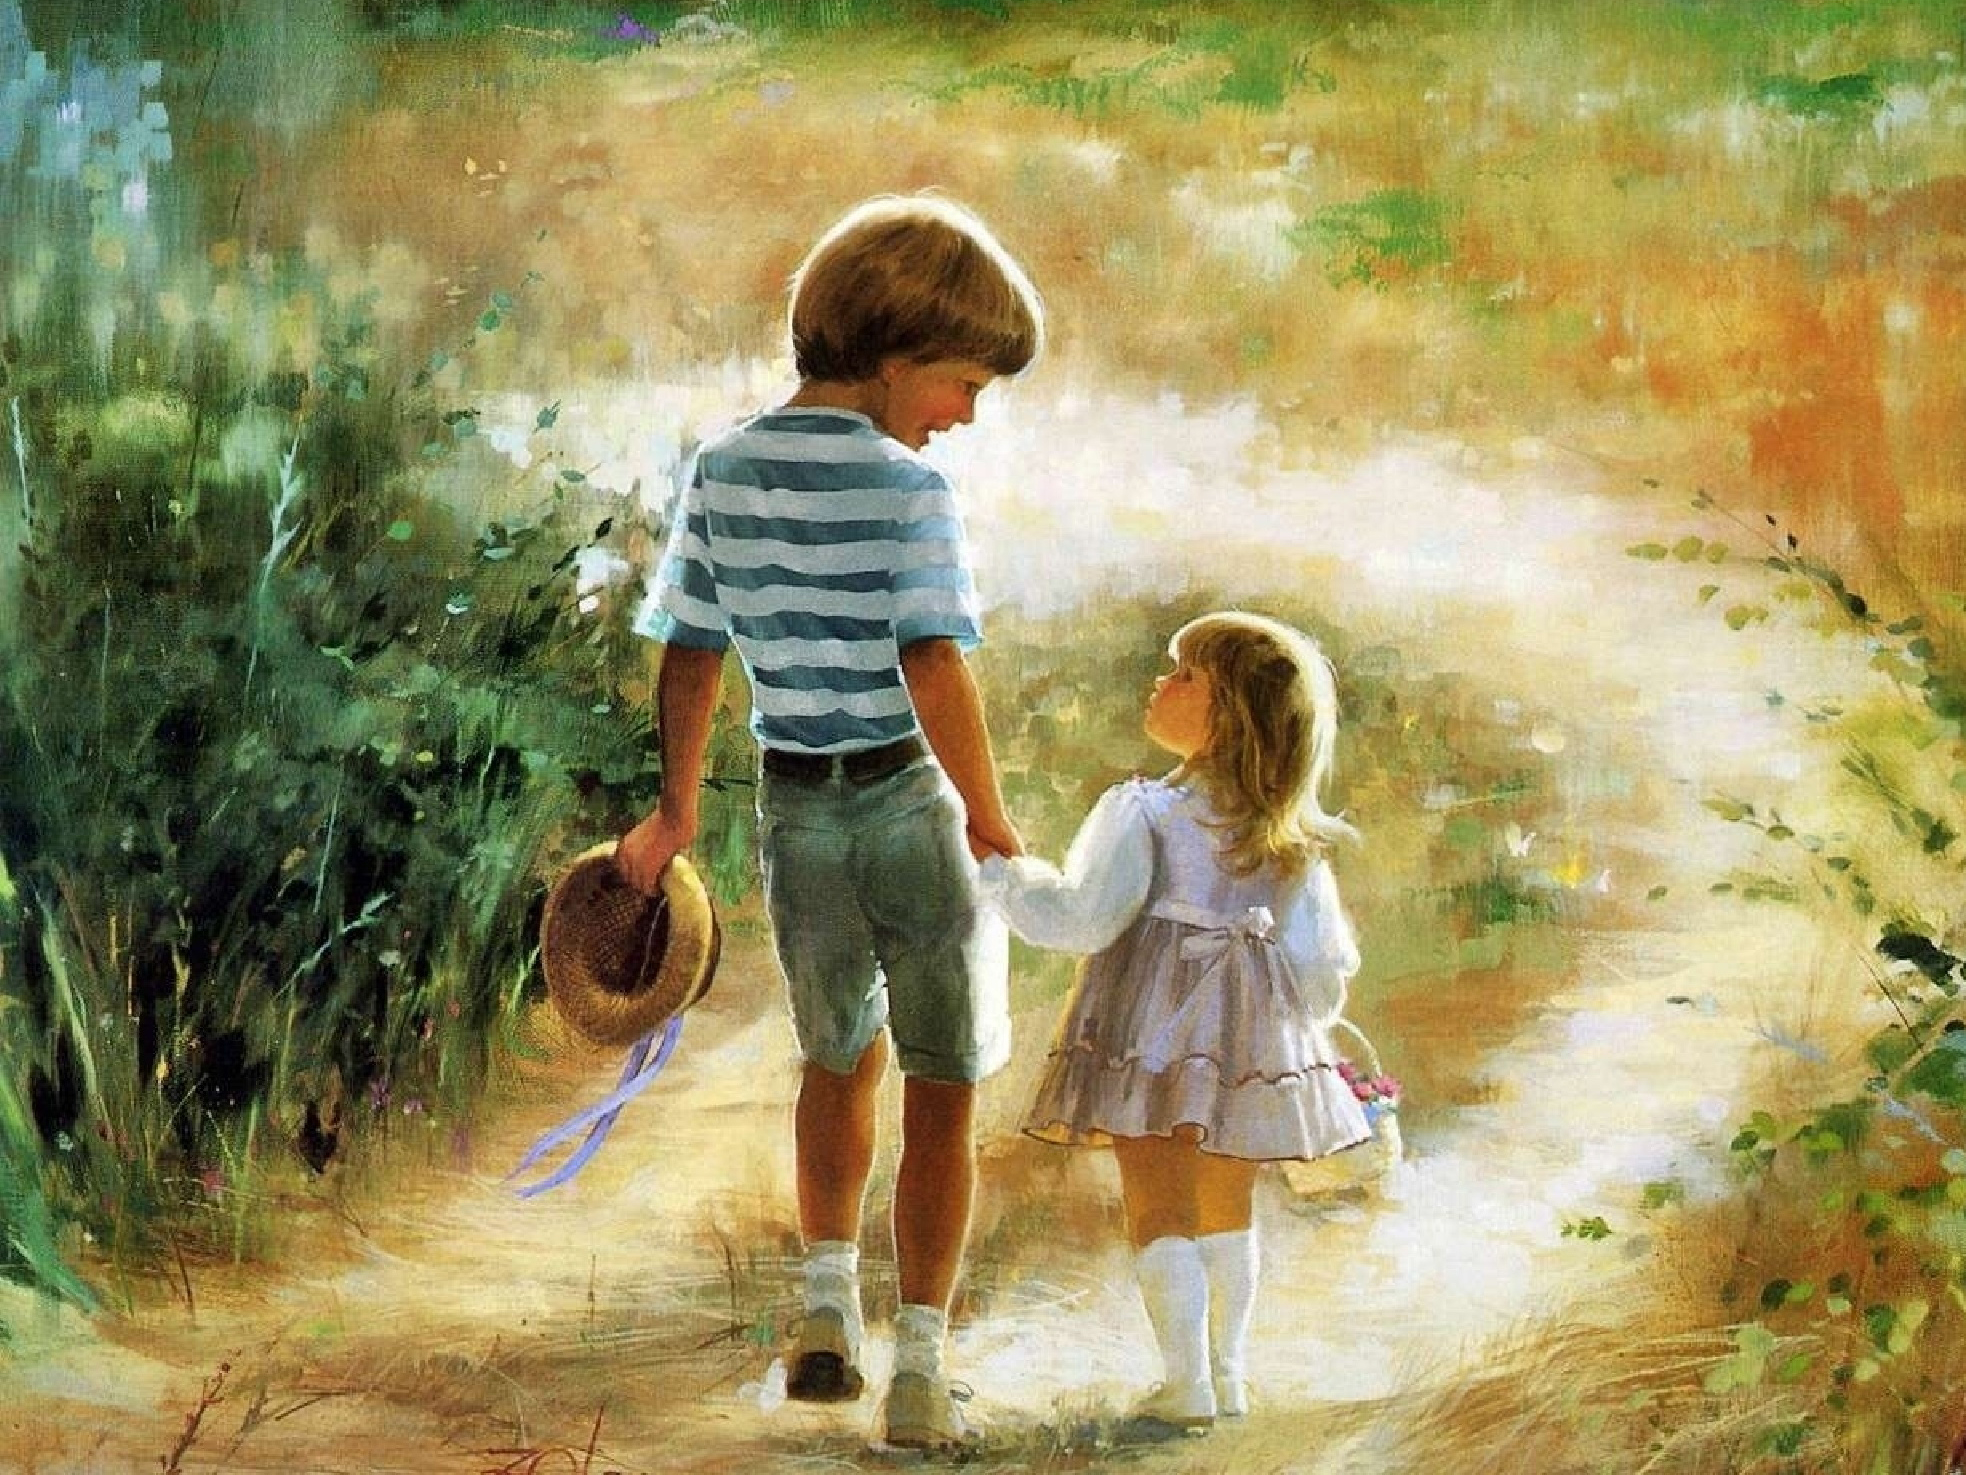 надо листочки картинки о доброте и любви к матери крепостью одиноко стоит